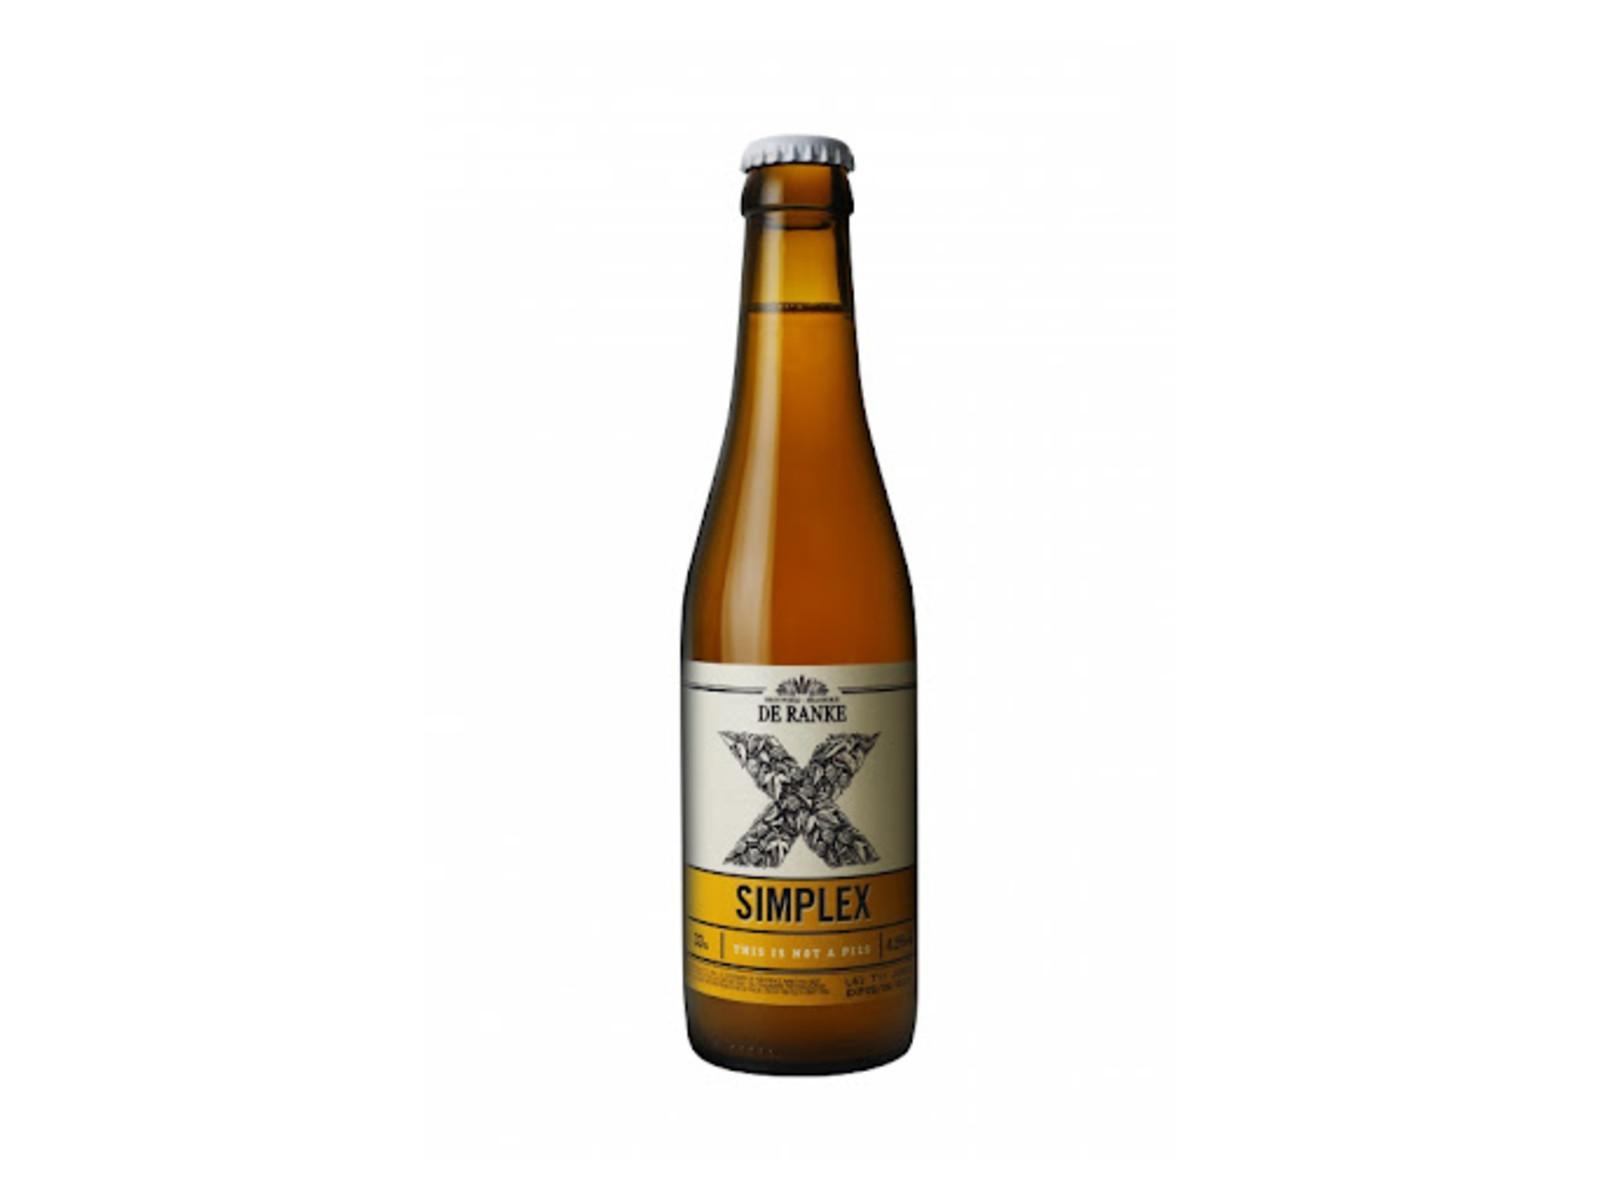 De Ranke Ranke Simplex - Belgian Pale Ale